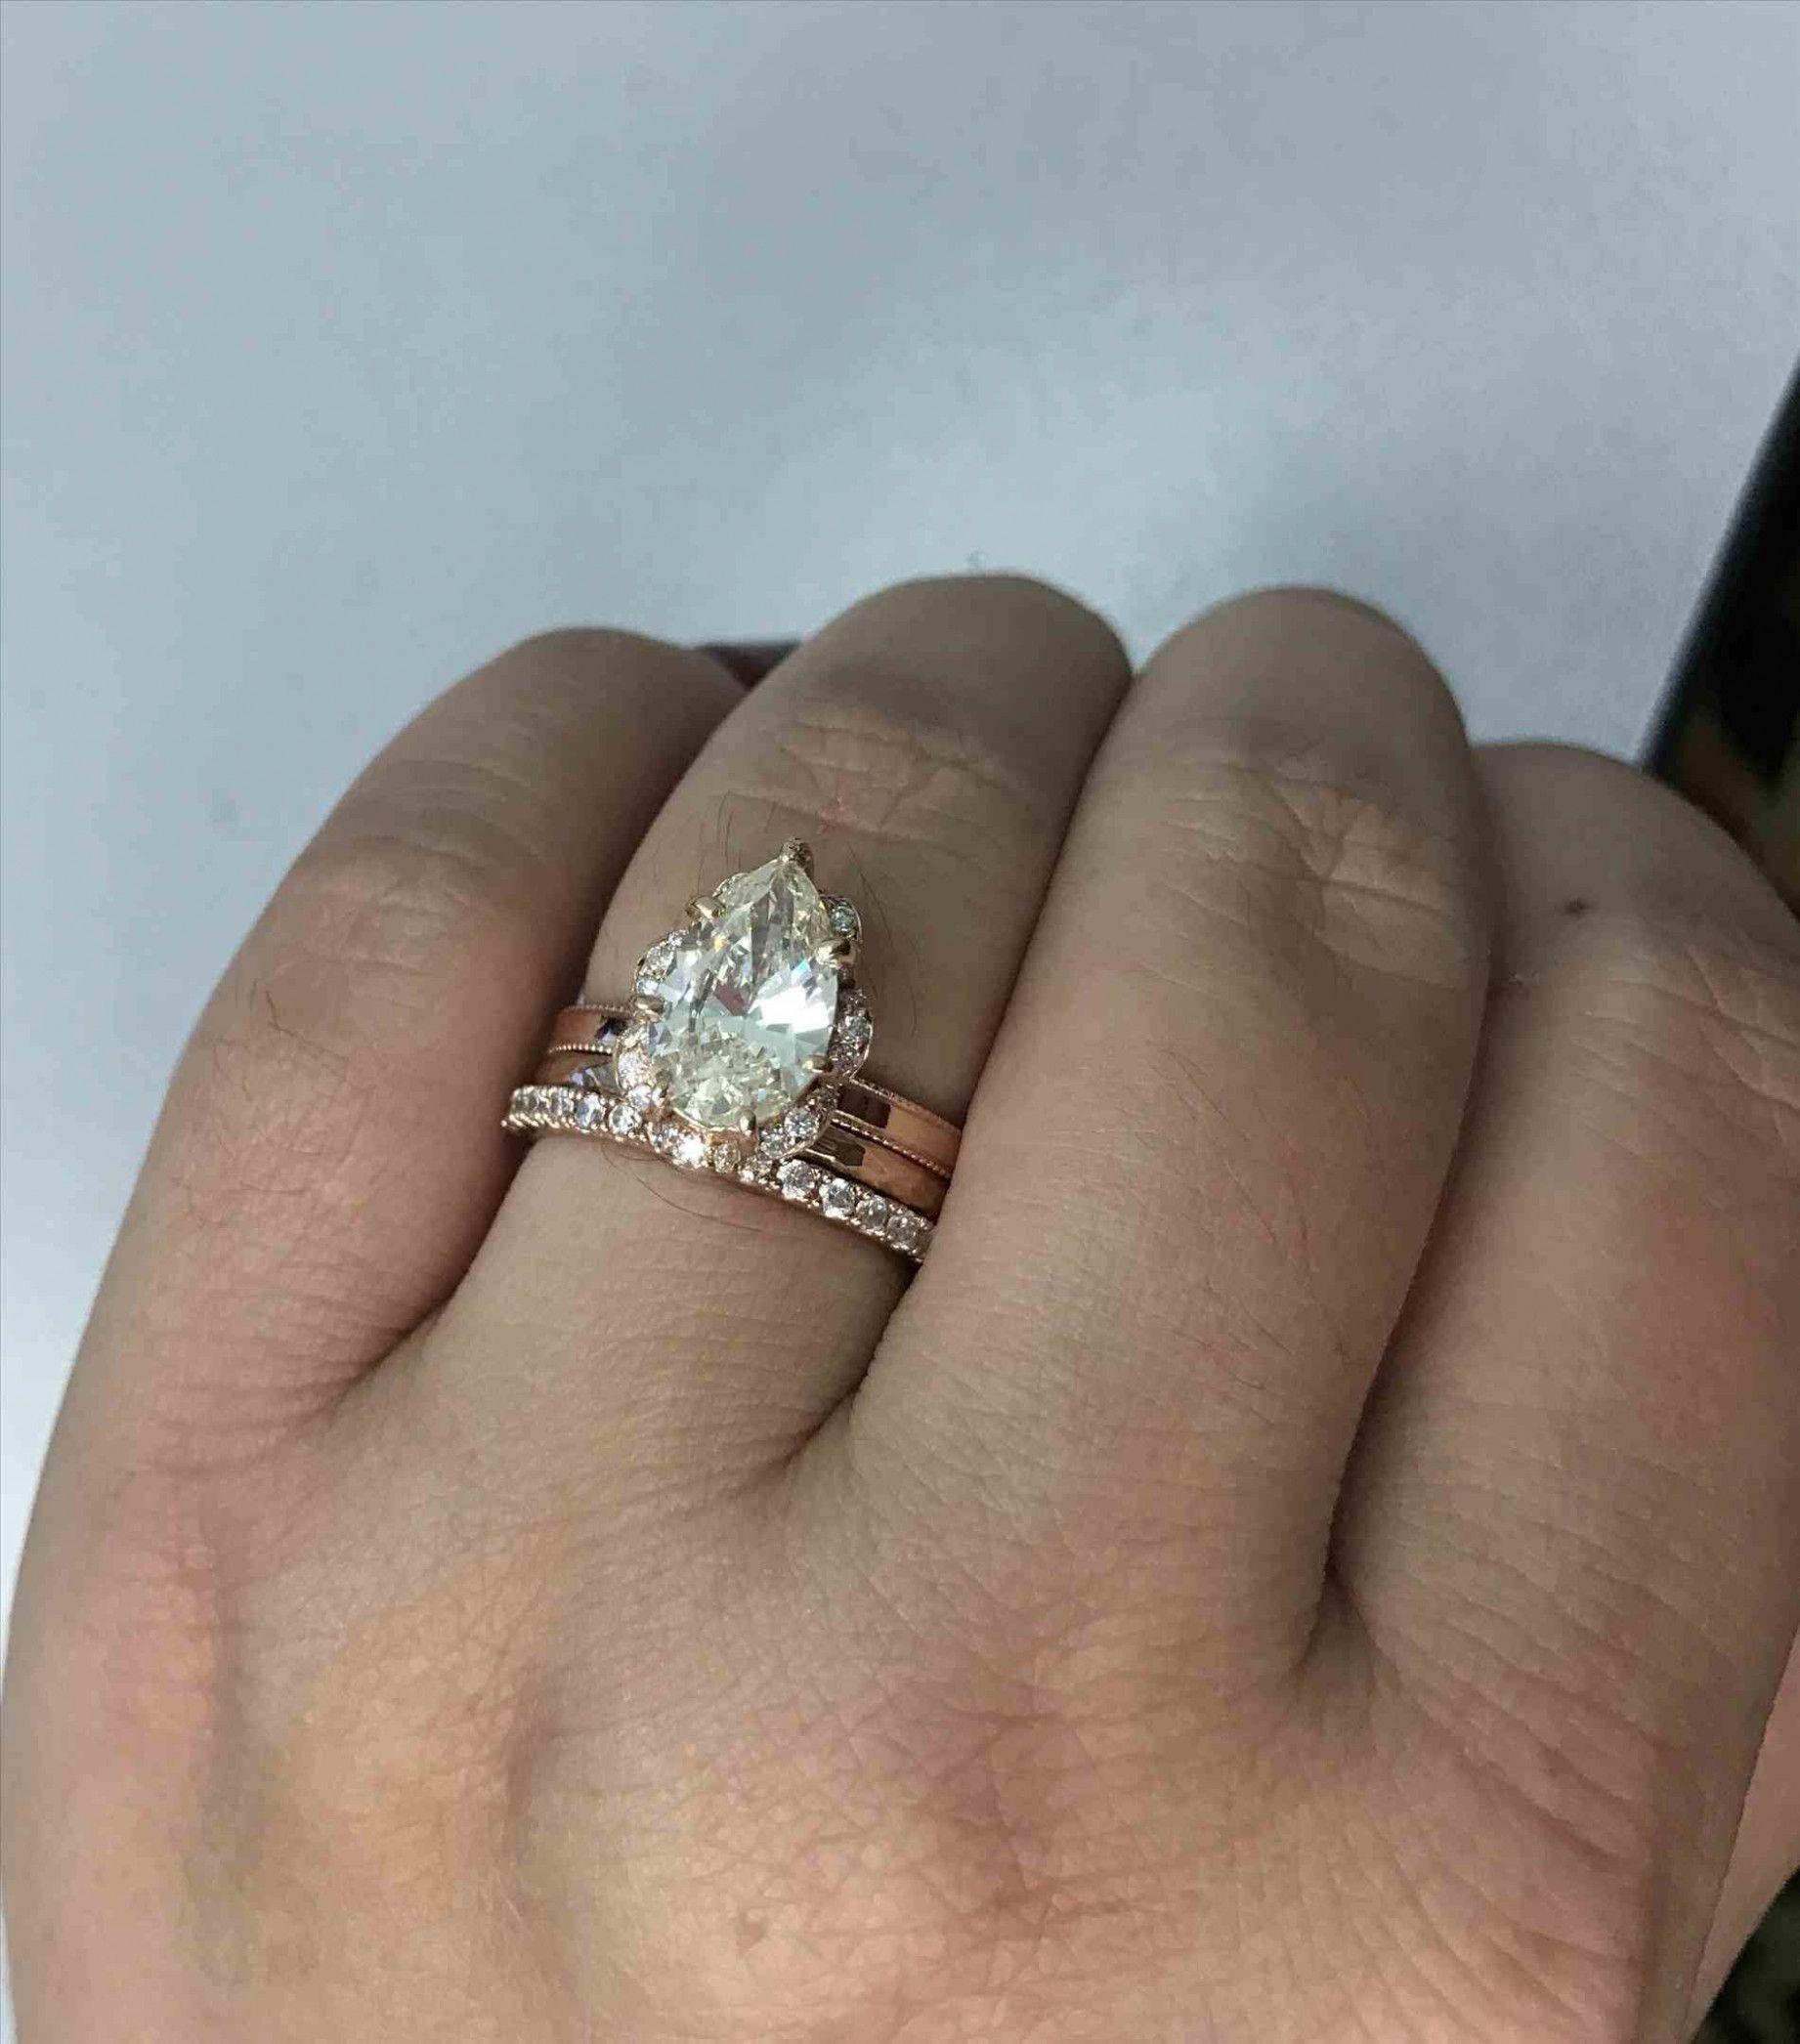 Wedding Rings Pear Shape Rose Gold Pear Shaped Wedding Rings Pear Shaped Diamond Engagement Rings Pear Wedding Ring